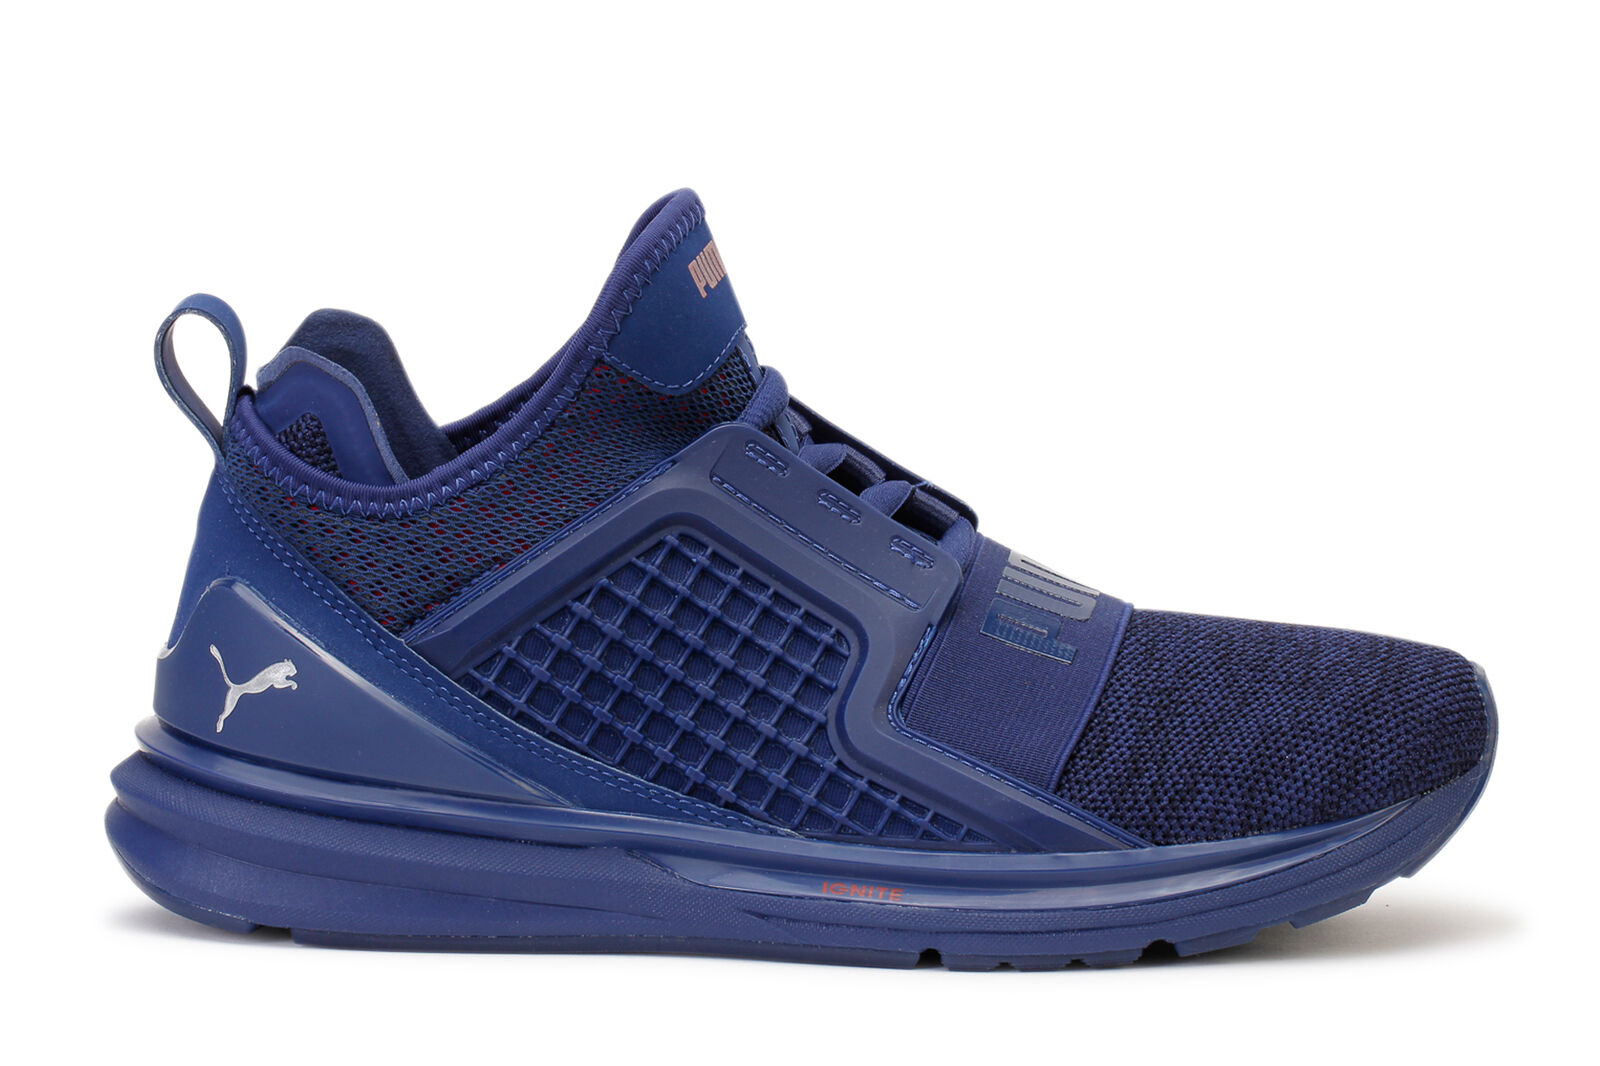 Puma Men's Sneakers Ignite Limitless Knit bluee Depth Toreador 189987-01